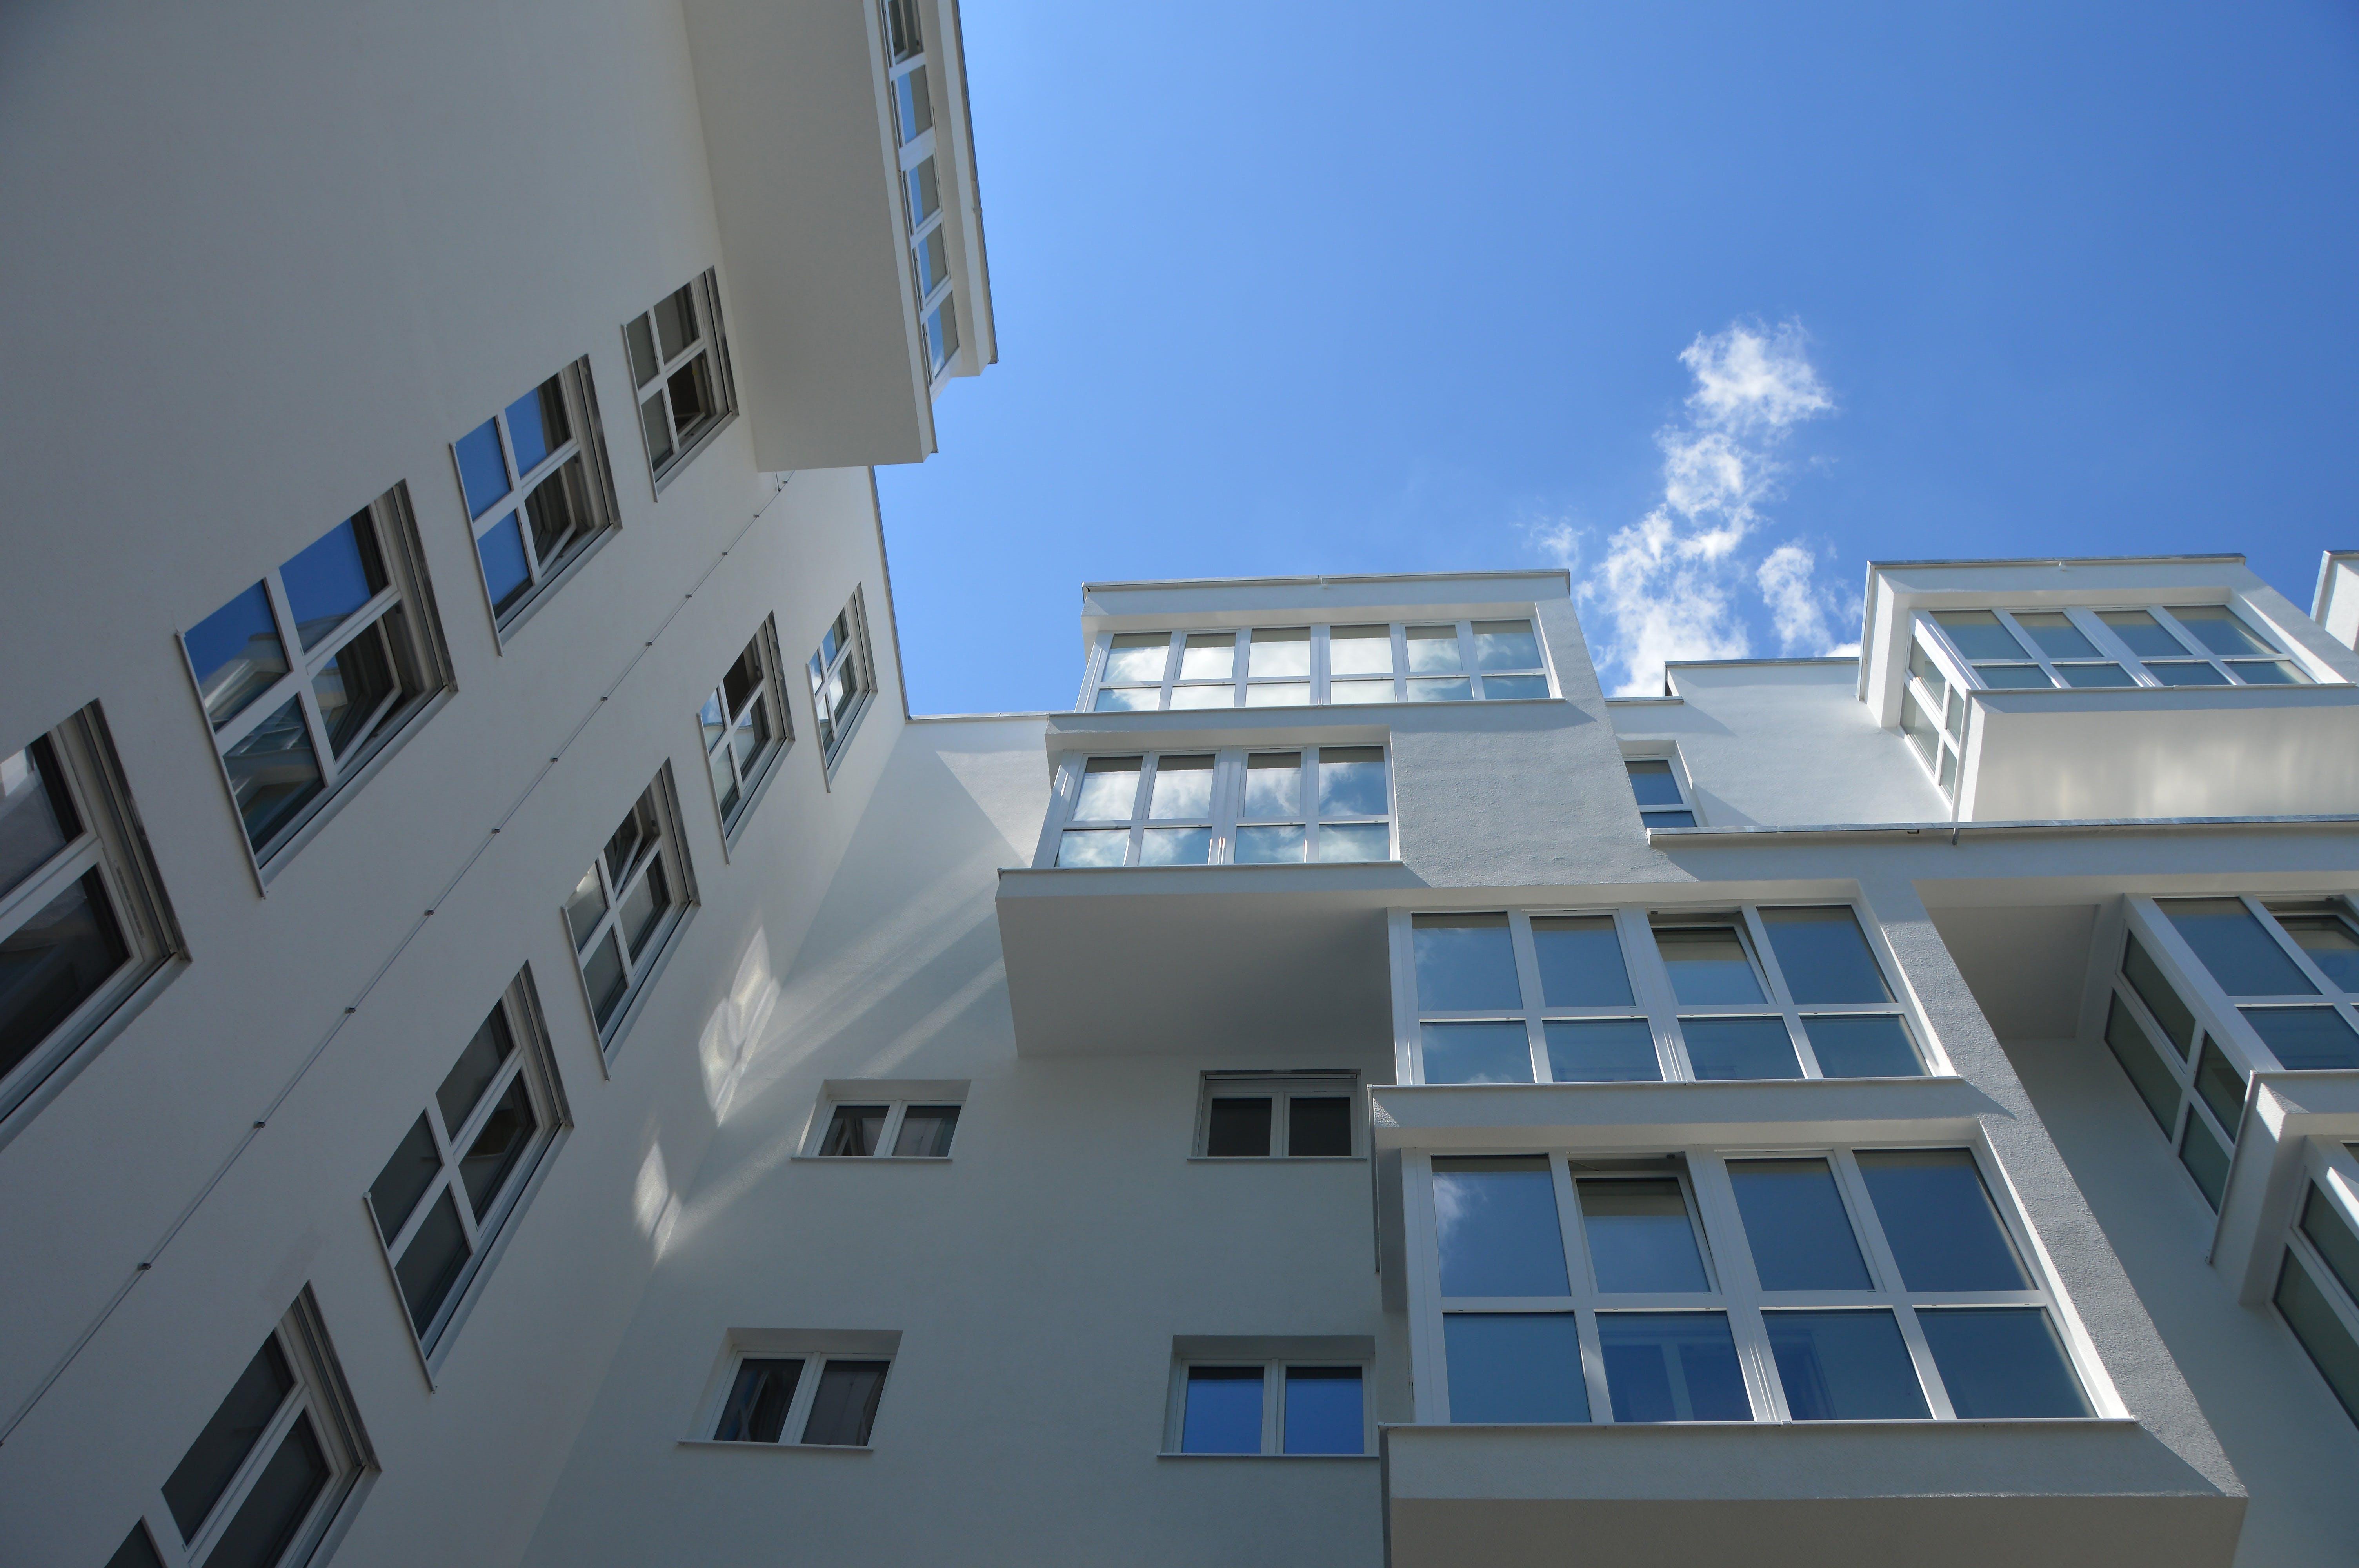 apartment, architecture, buildings